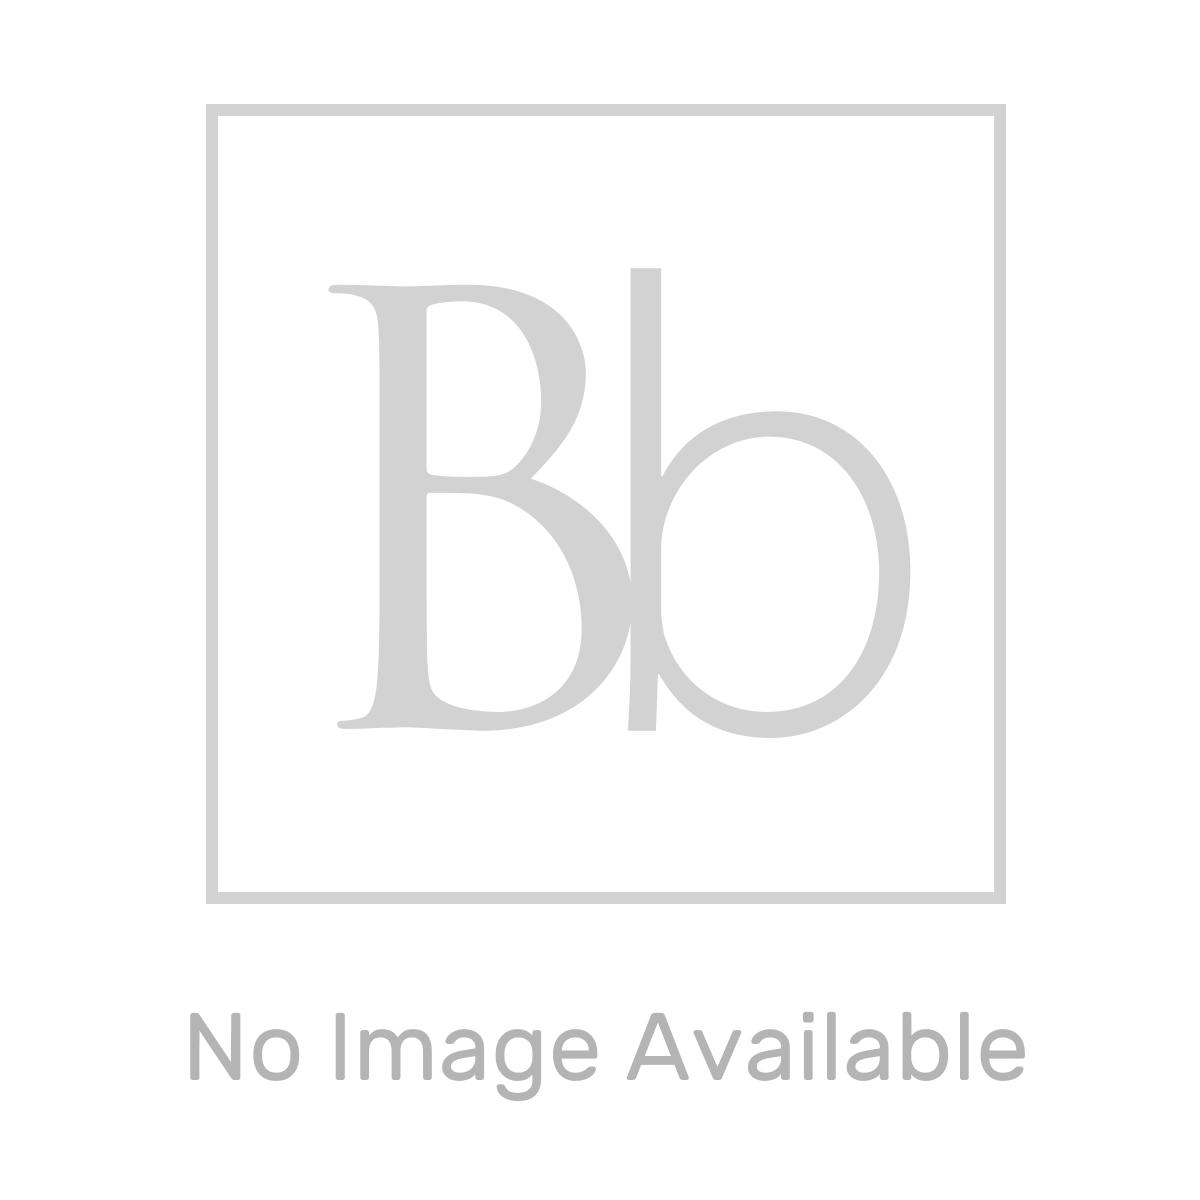 Zenith Dune Bath Shower Mixer Tap Lifestyle